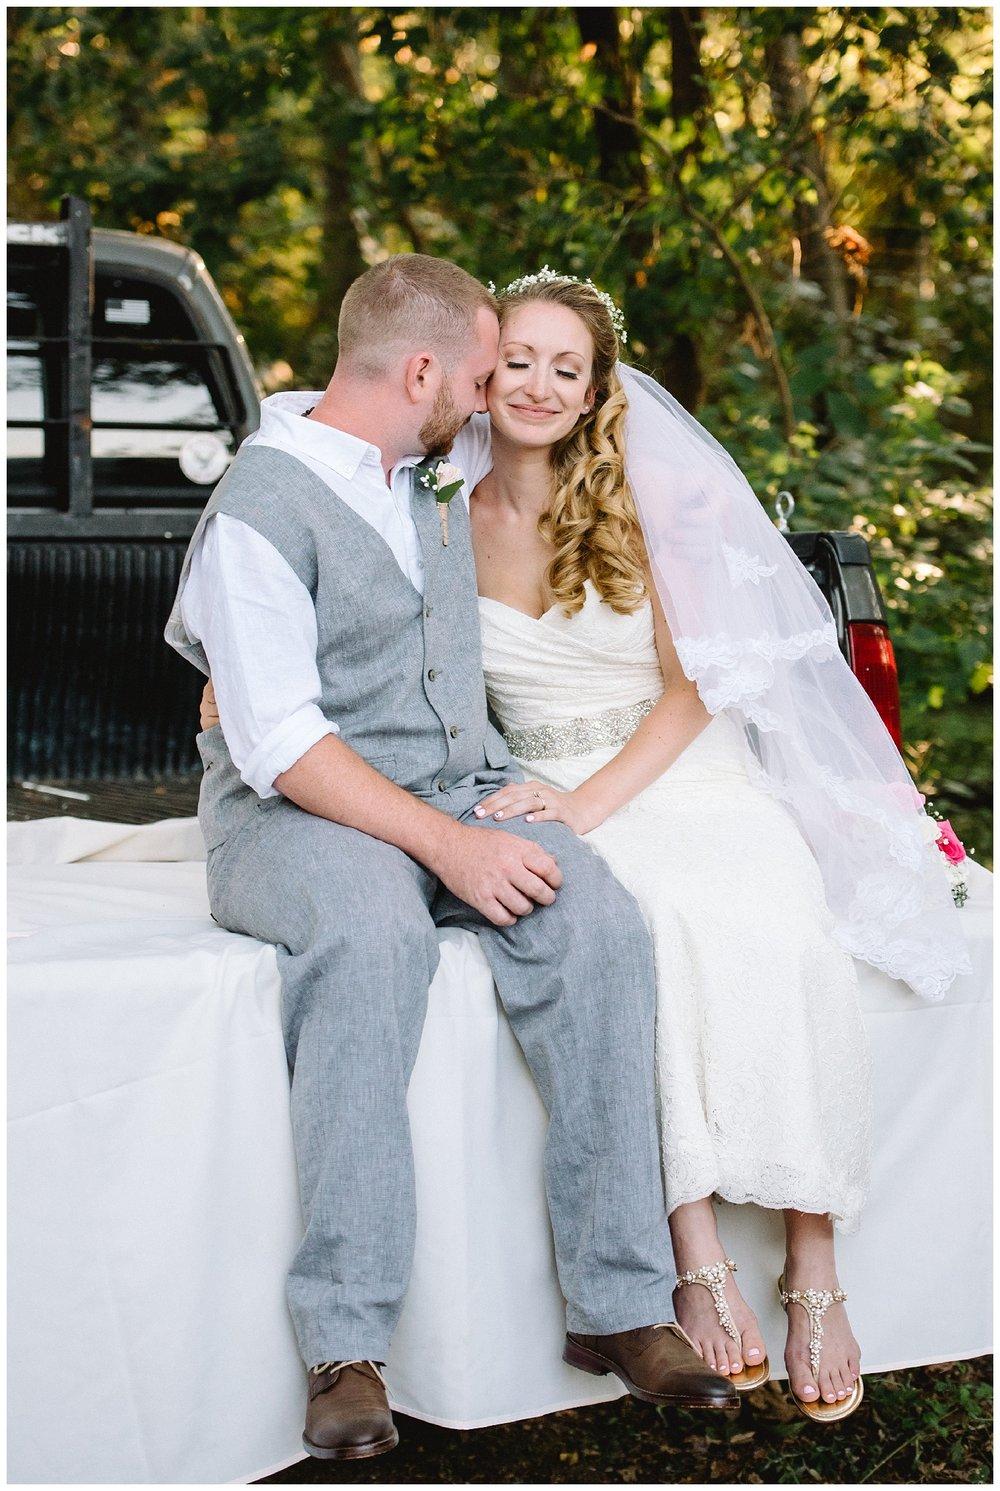 2016-09-02_0075Whimsical Backyard Summer Wedding Peabody MA Wedding Photographer.jpg